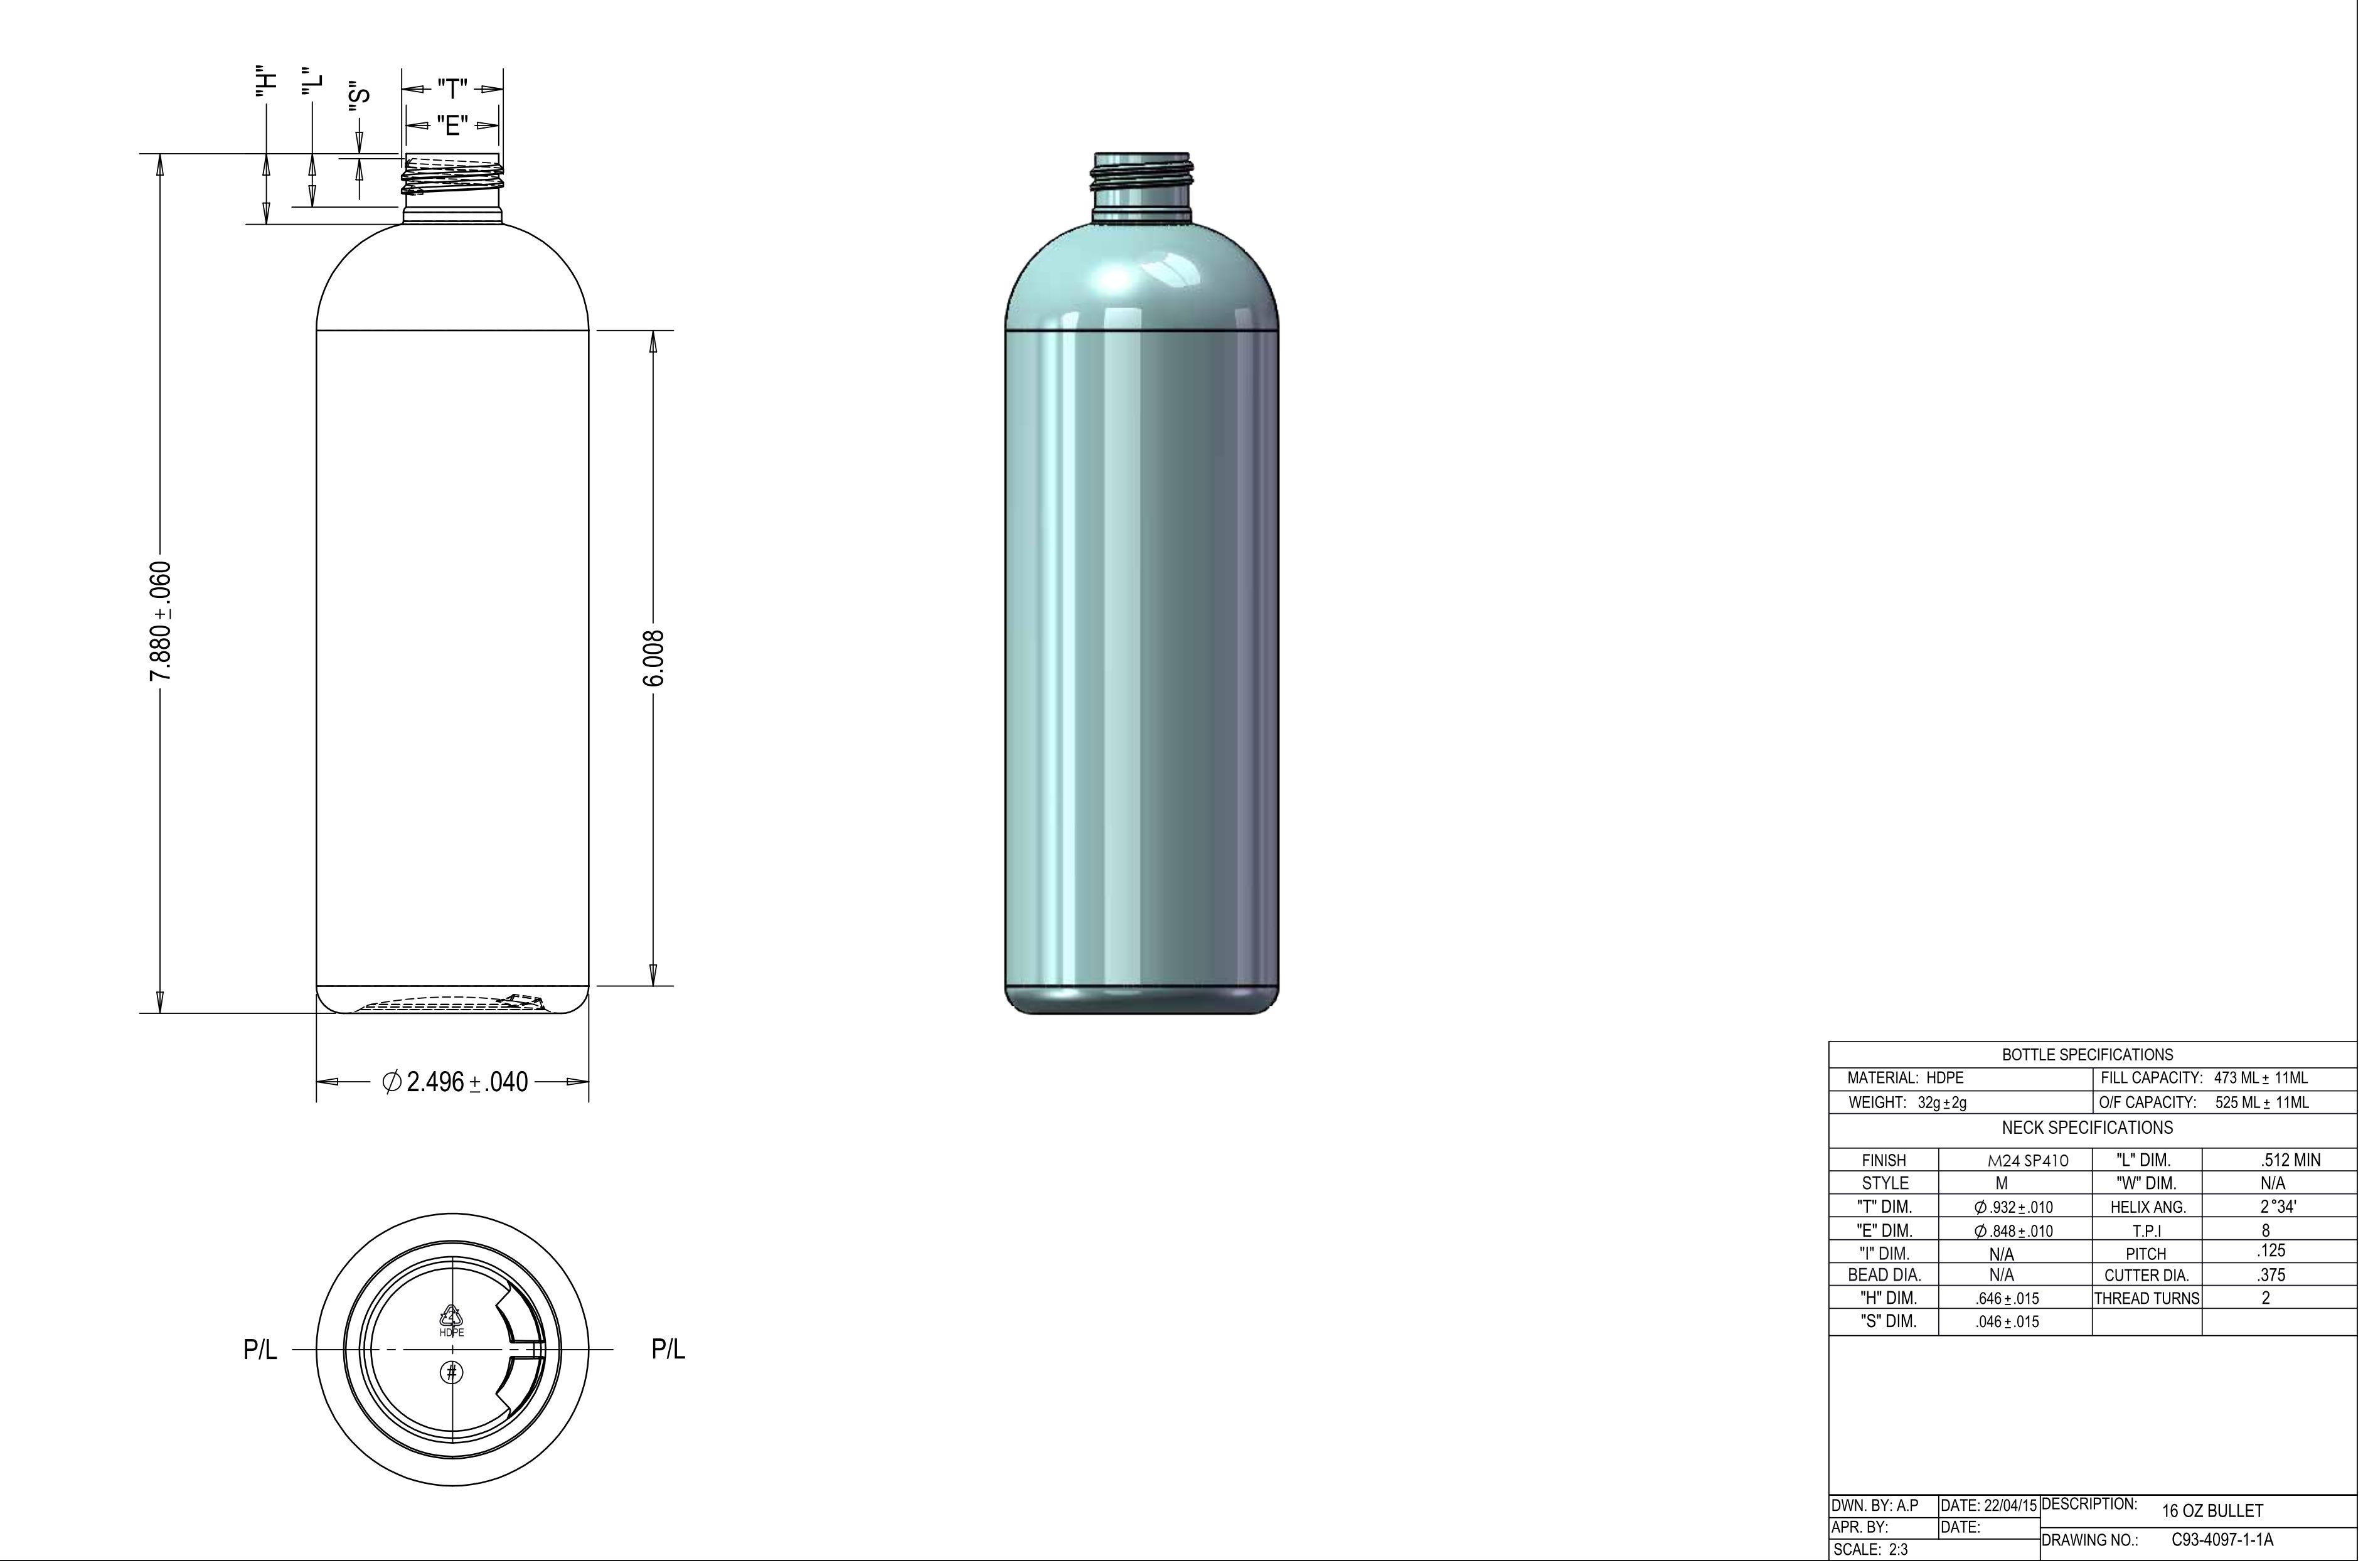 10,000 HDPE Bottles, NATURAL, NEW, 24/410 Neck, 16oz Boston Round - Image 6 of 6